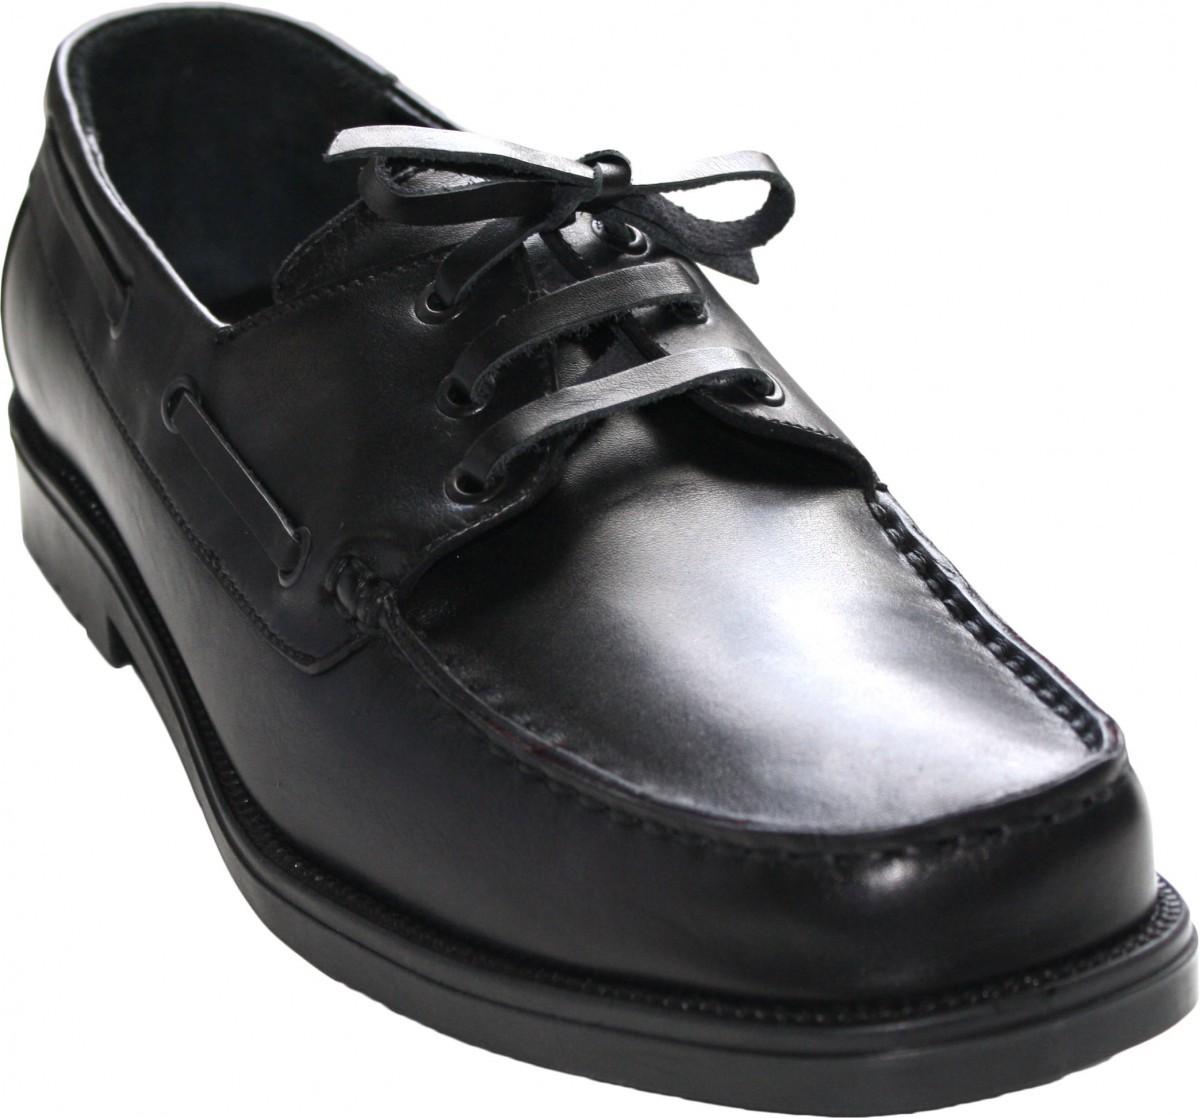 Stiefelschuhe Segelschuhe Halbschuhe aus echtleder Rindsleder Schuhe schwarz